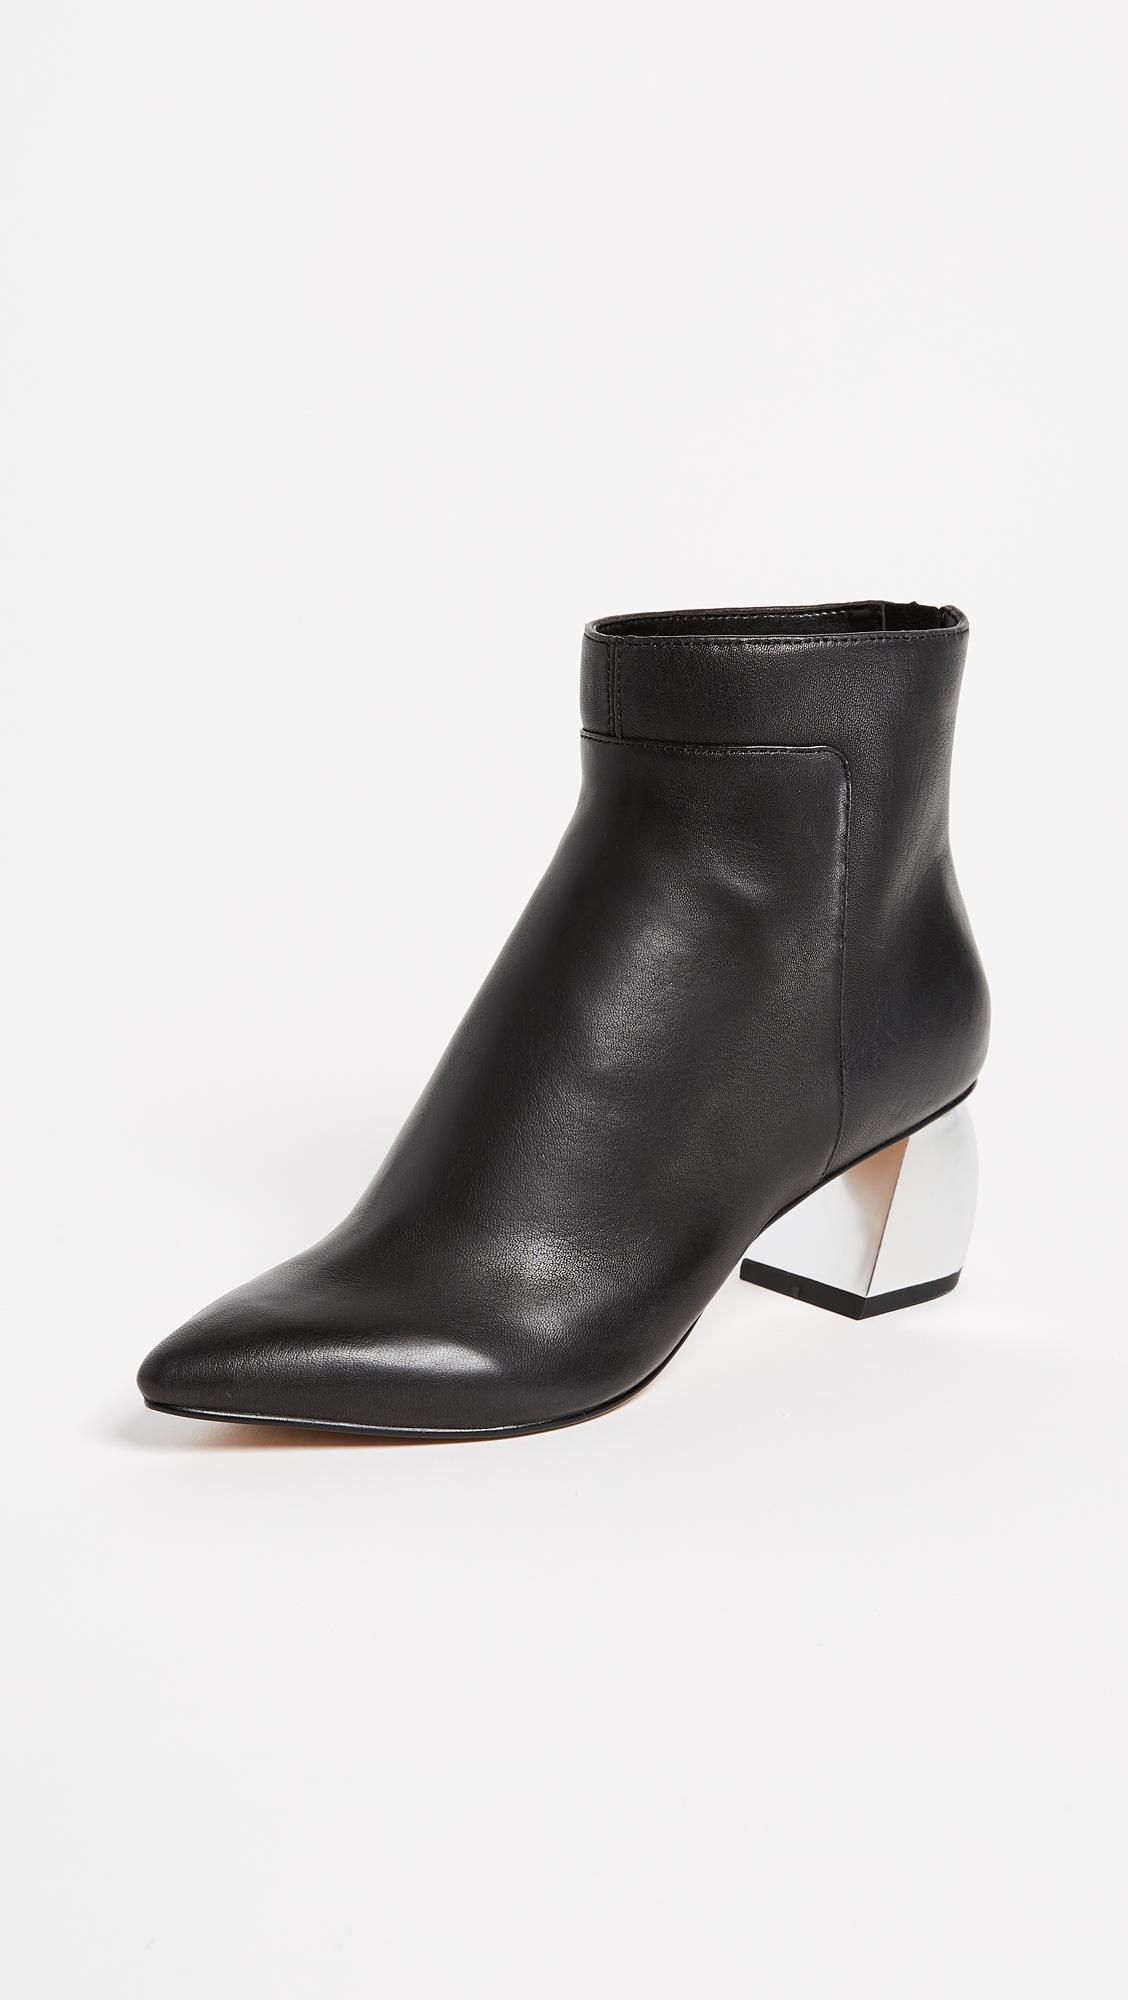 29c2eff04a74b Dolce Vita Black Jonn Block Heel Ankle Boots